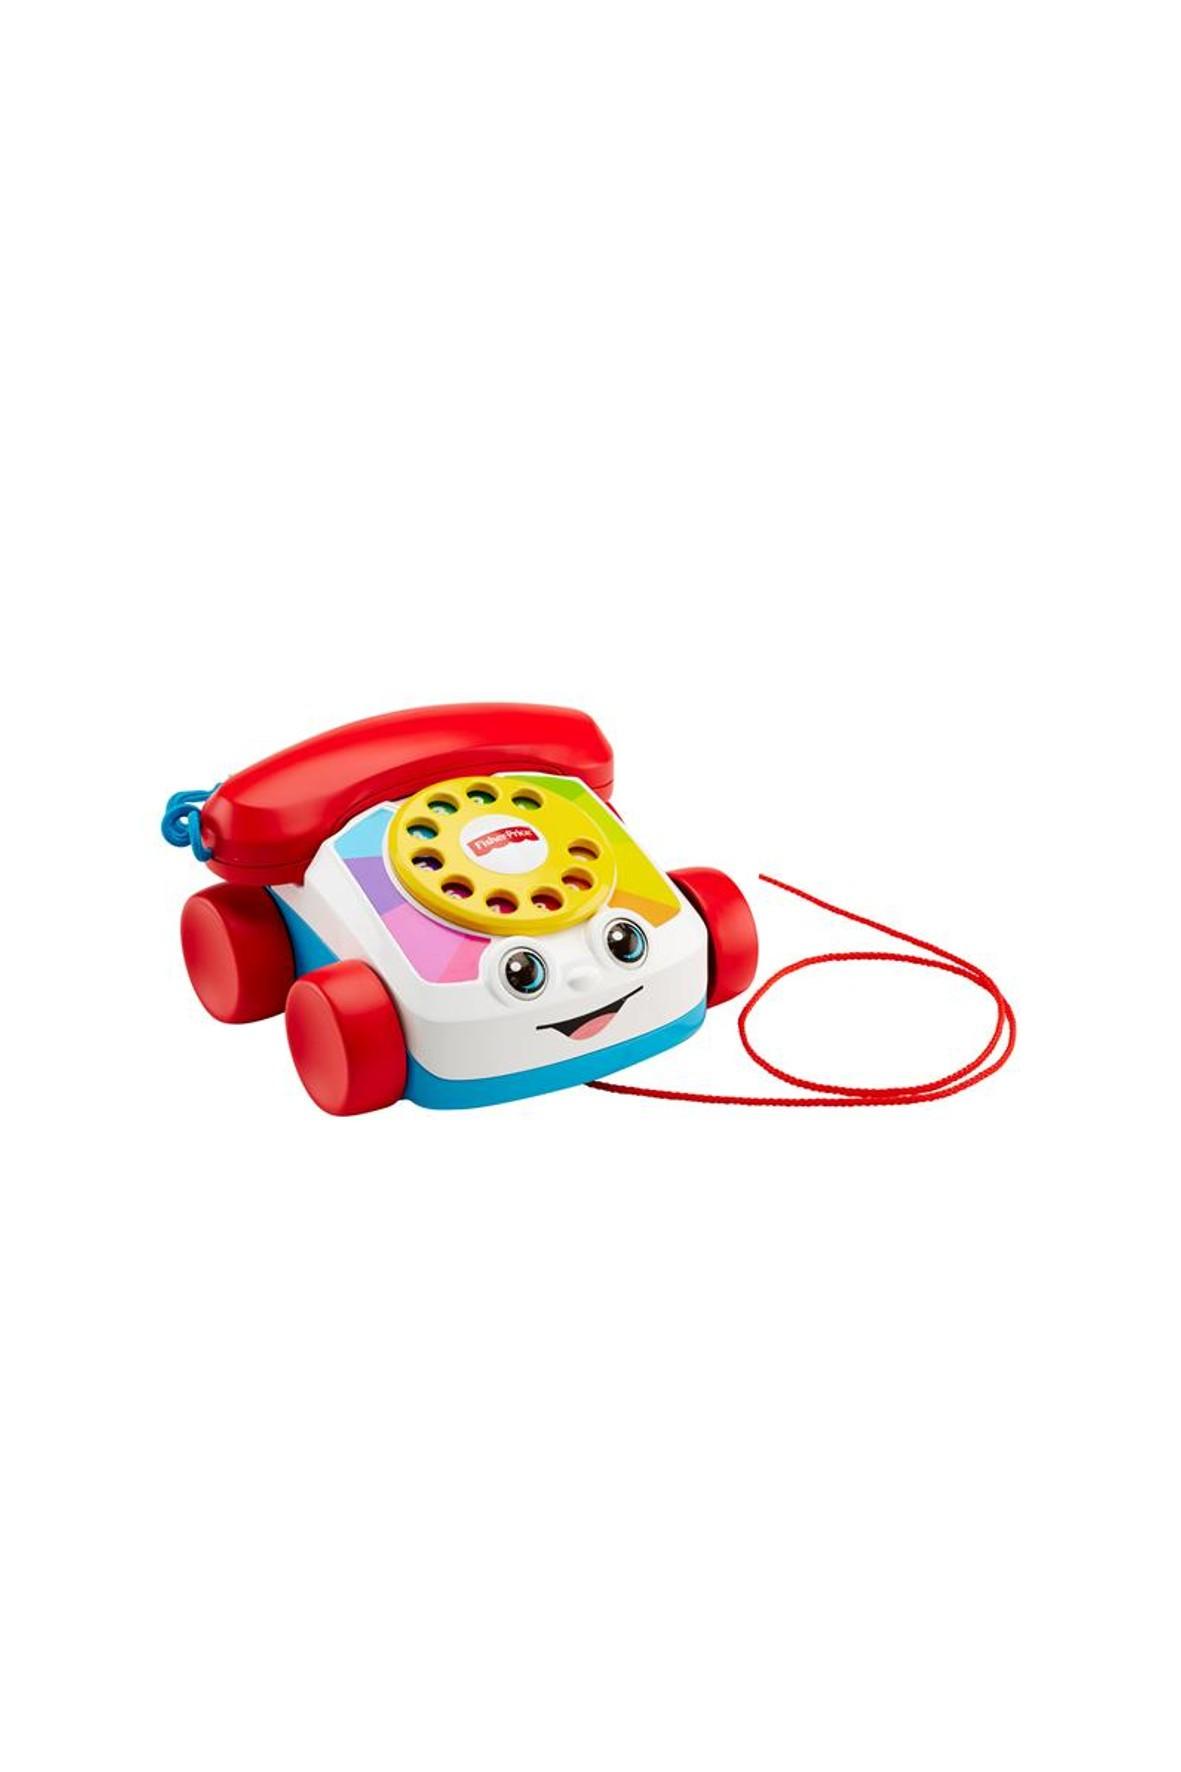 Telefon gadułki-zabawka edukacyjna